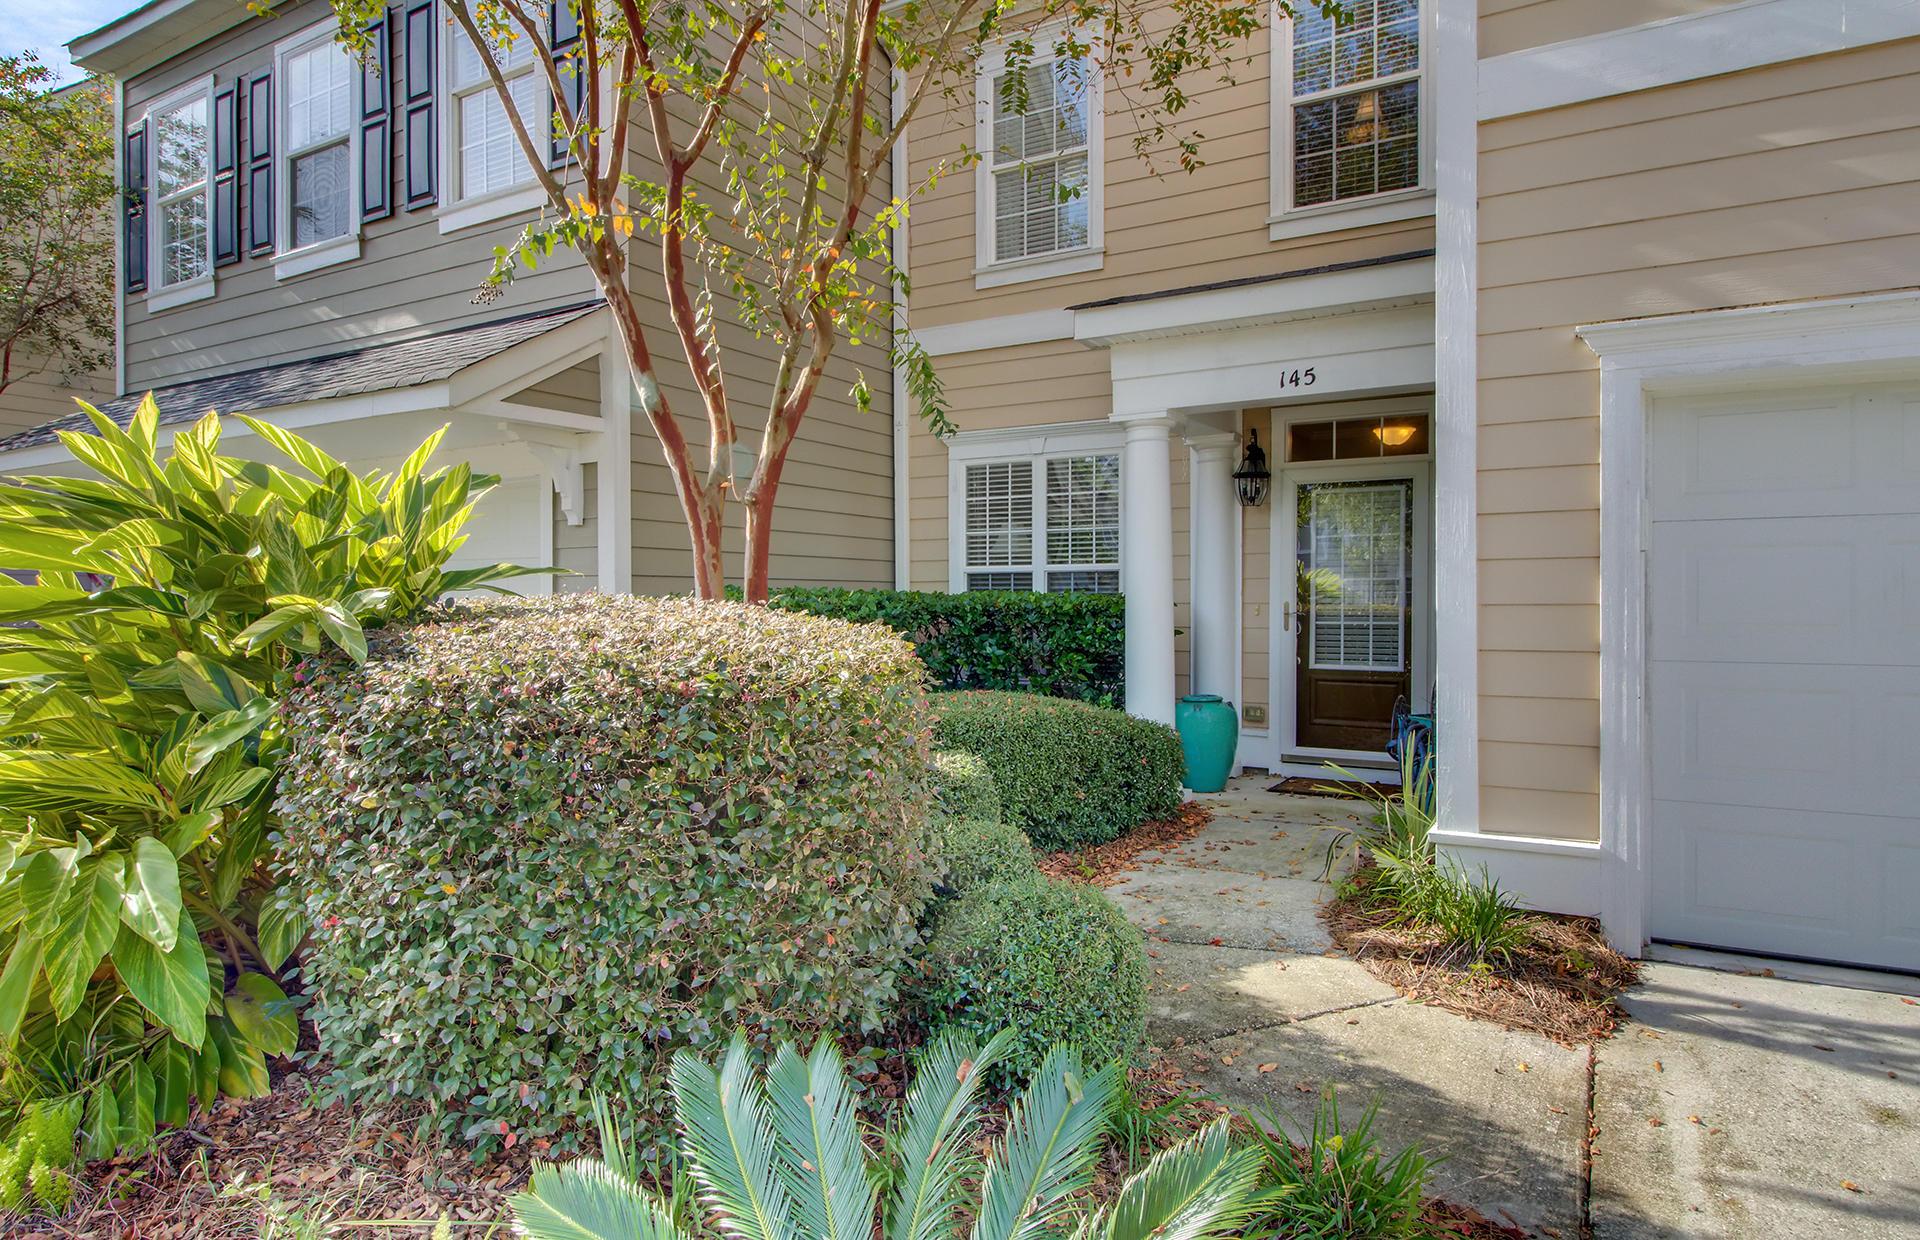 Dunes West Homes For Sale - 145 Fresh Meadow, Mount Pleasant, SC - 3